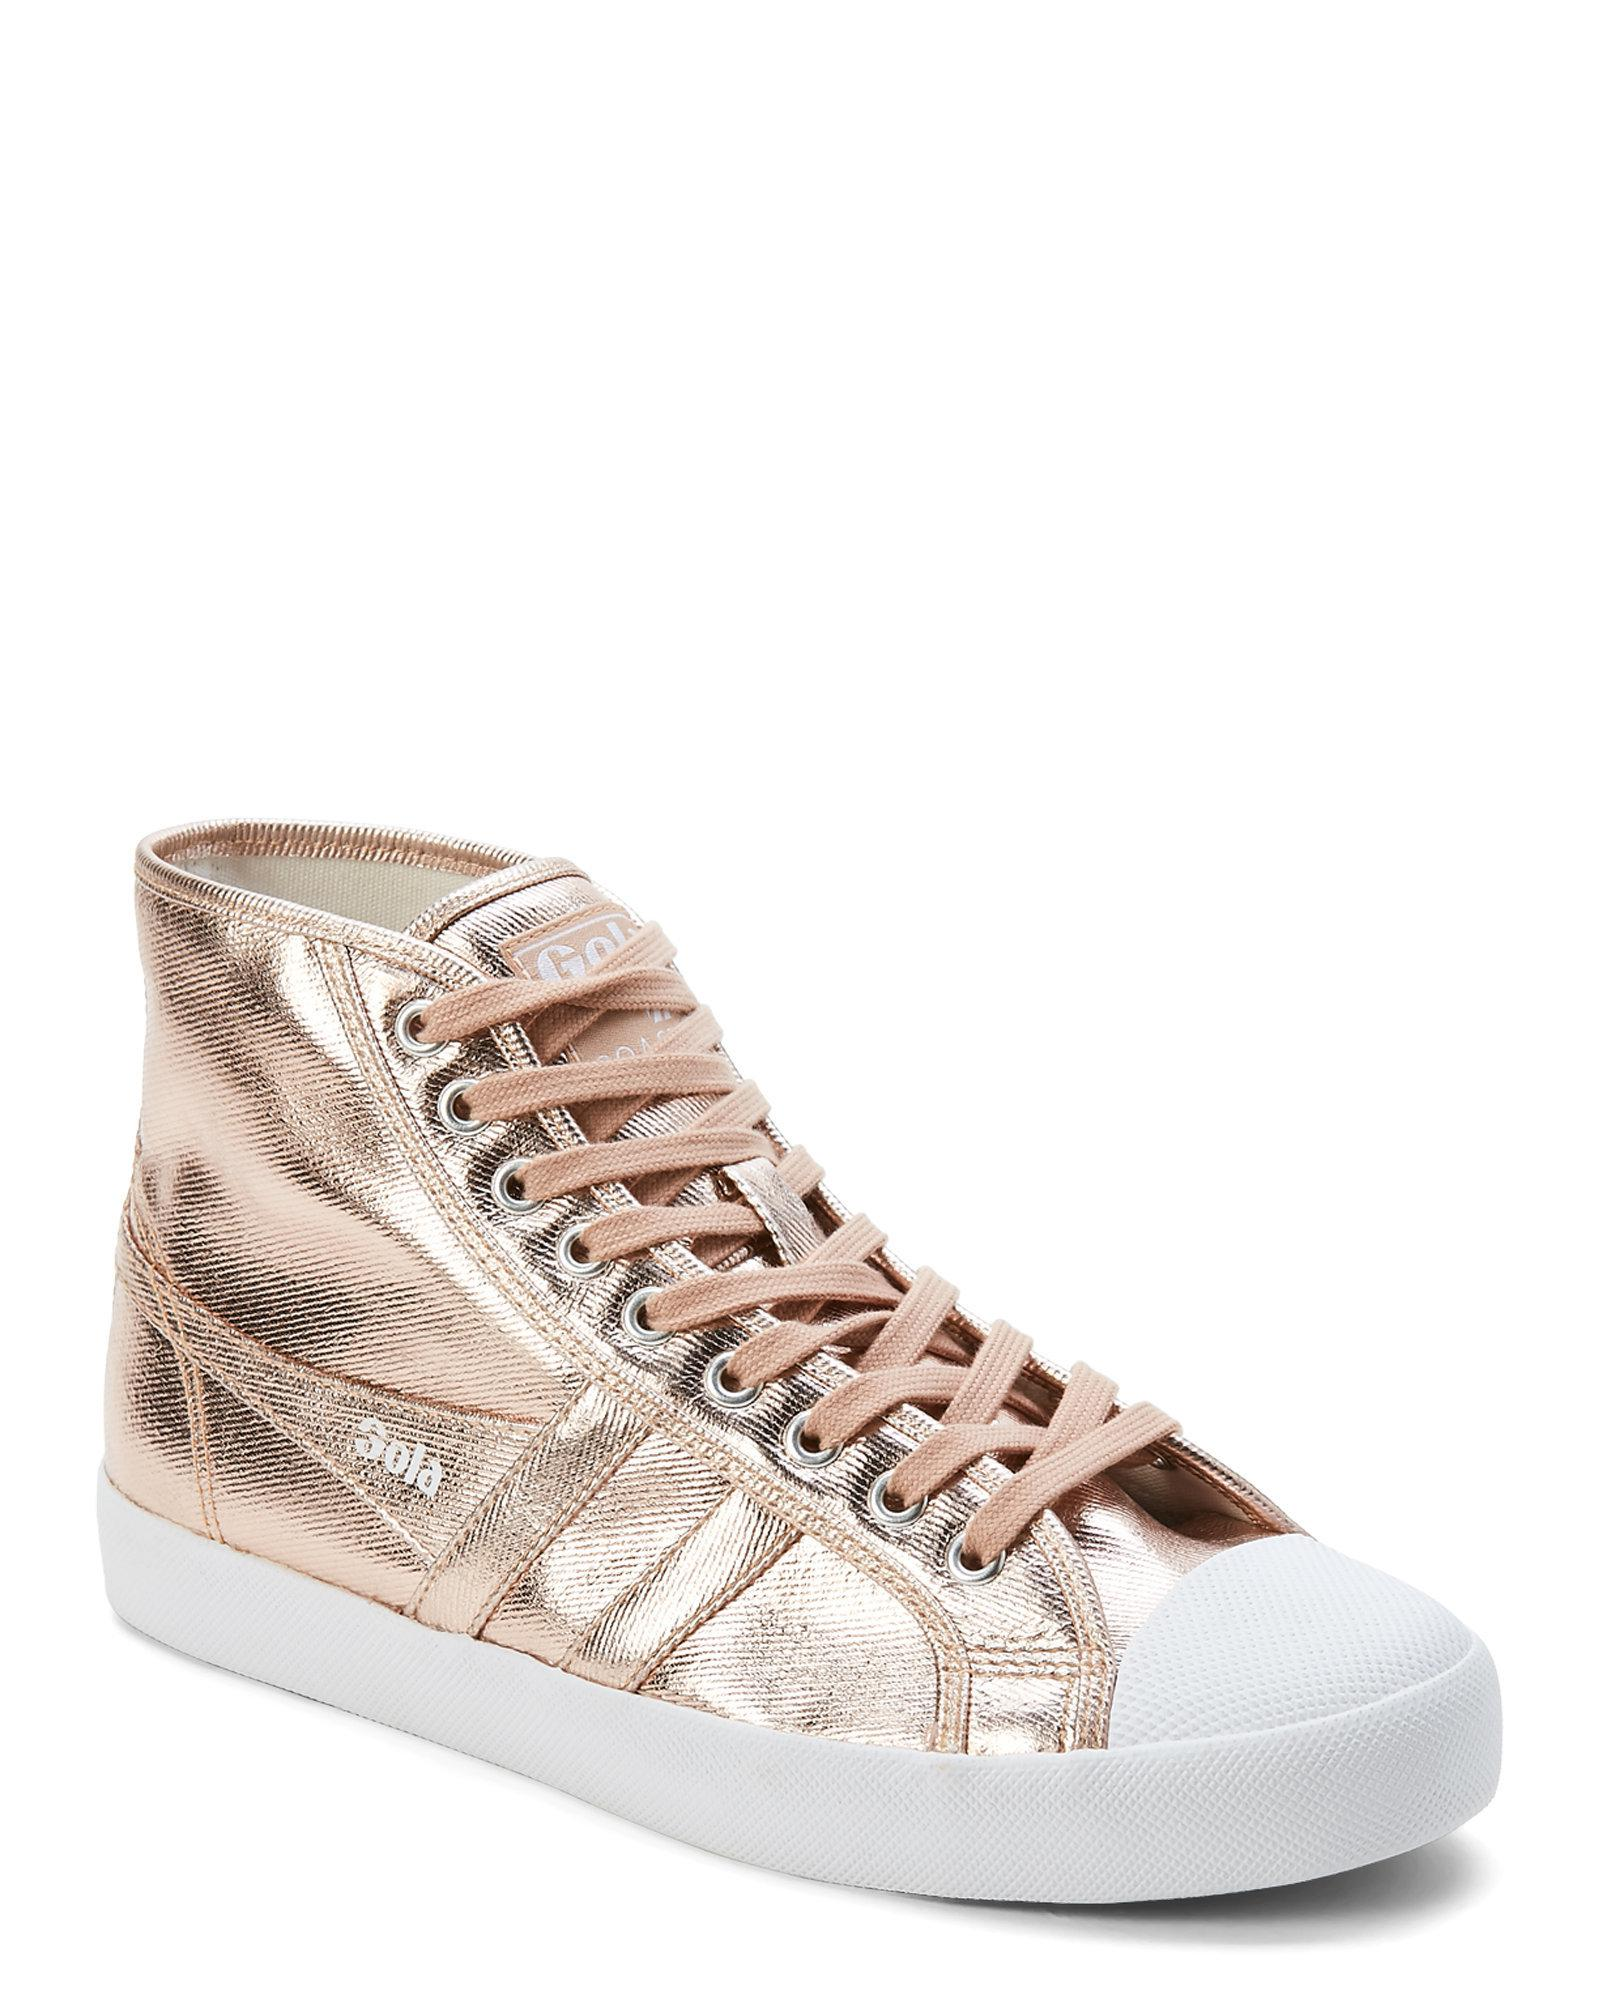 05c20adee03d Lyst - Gola Rose Gold Coaster Metallic High-top Sneakers in Metallic